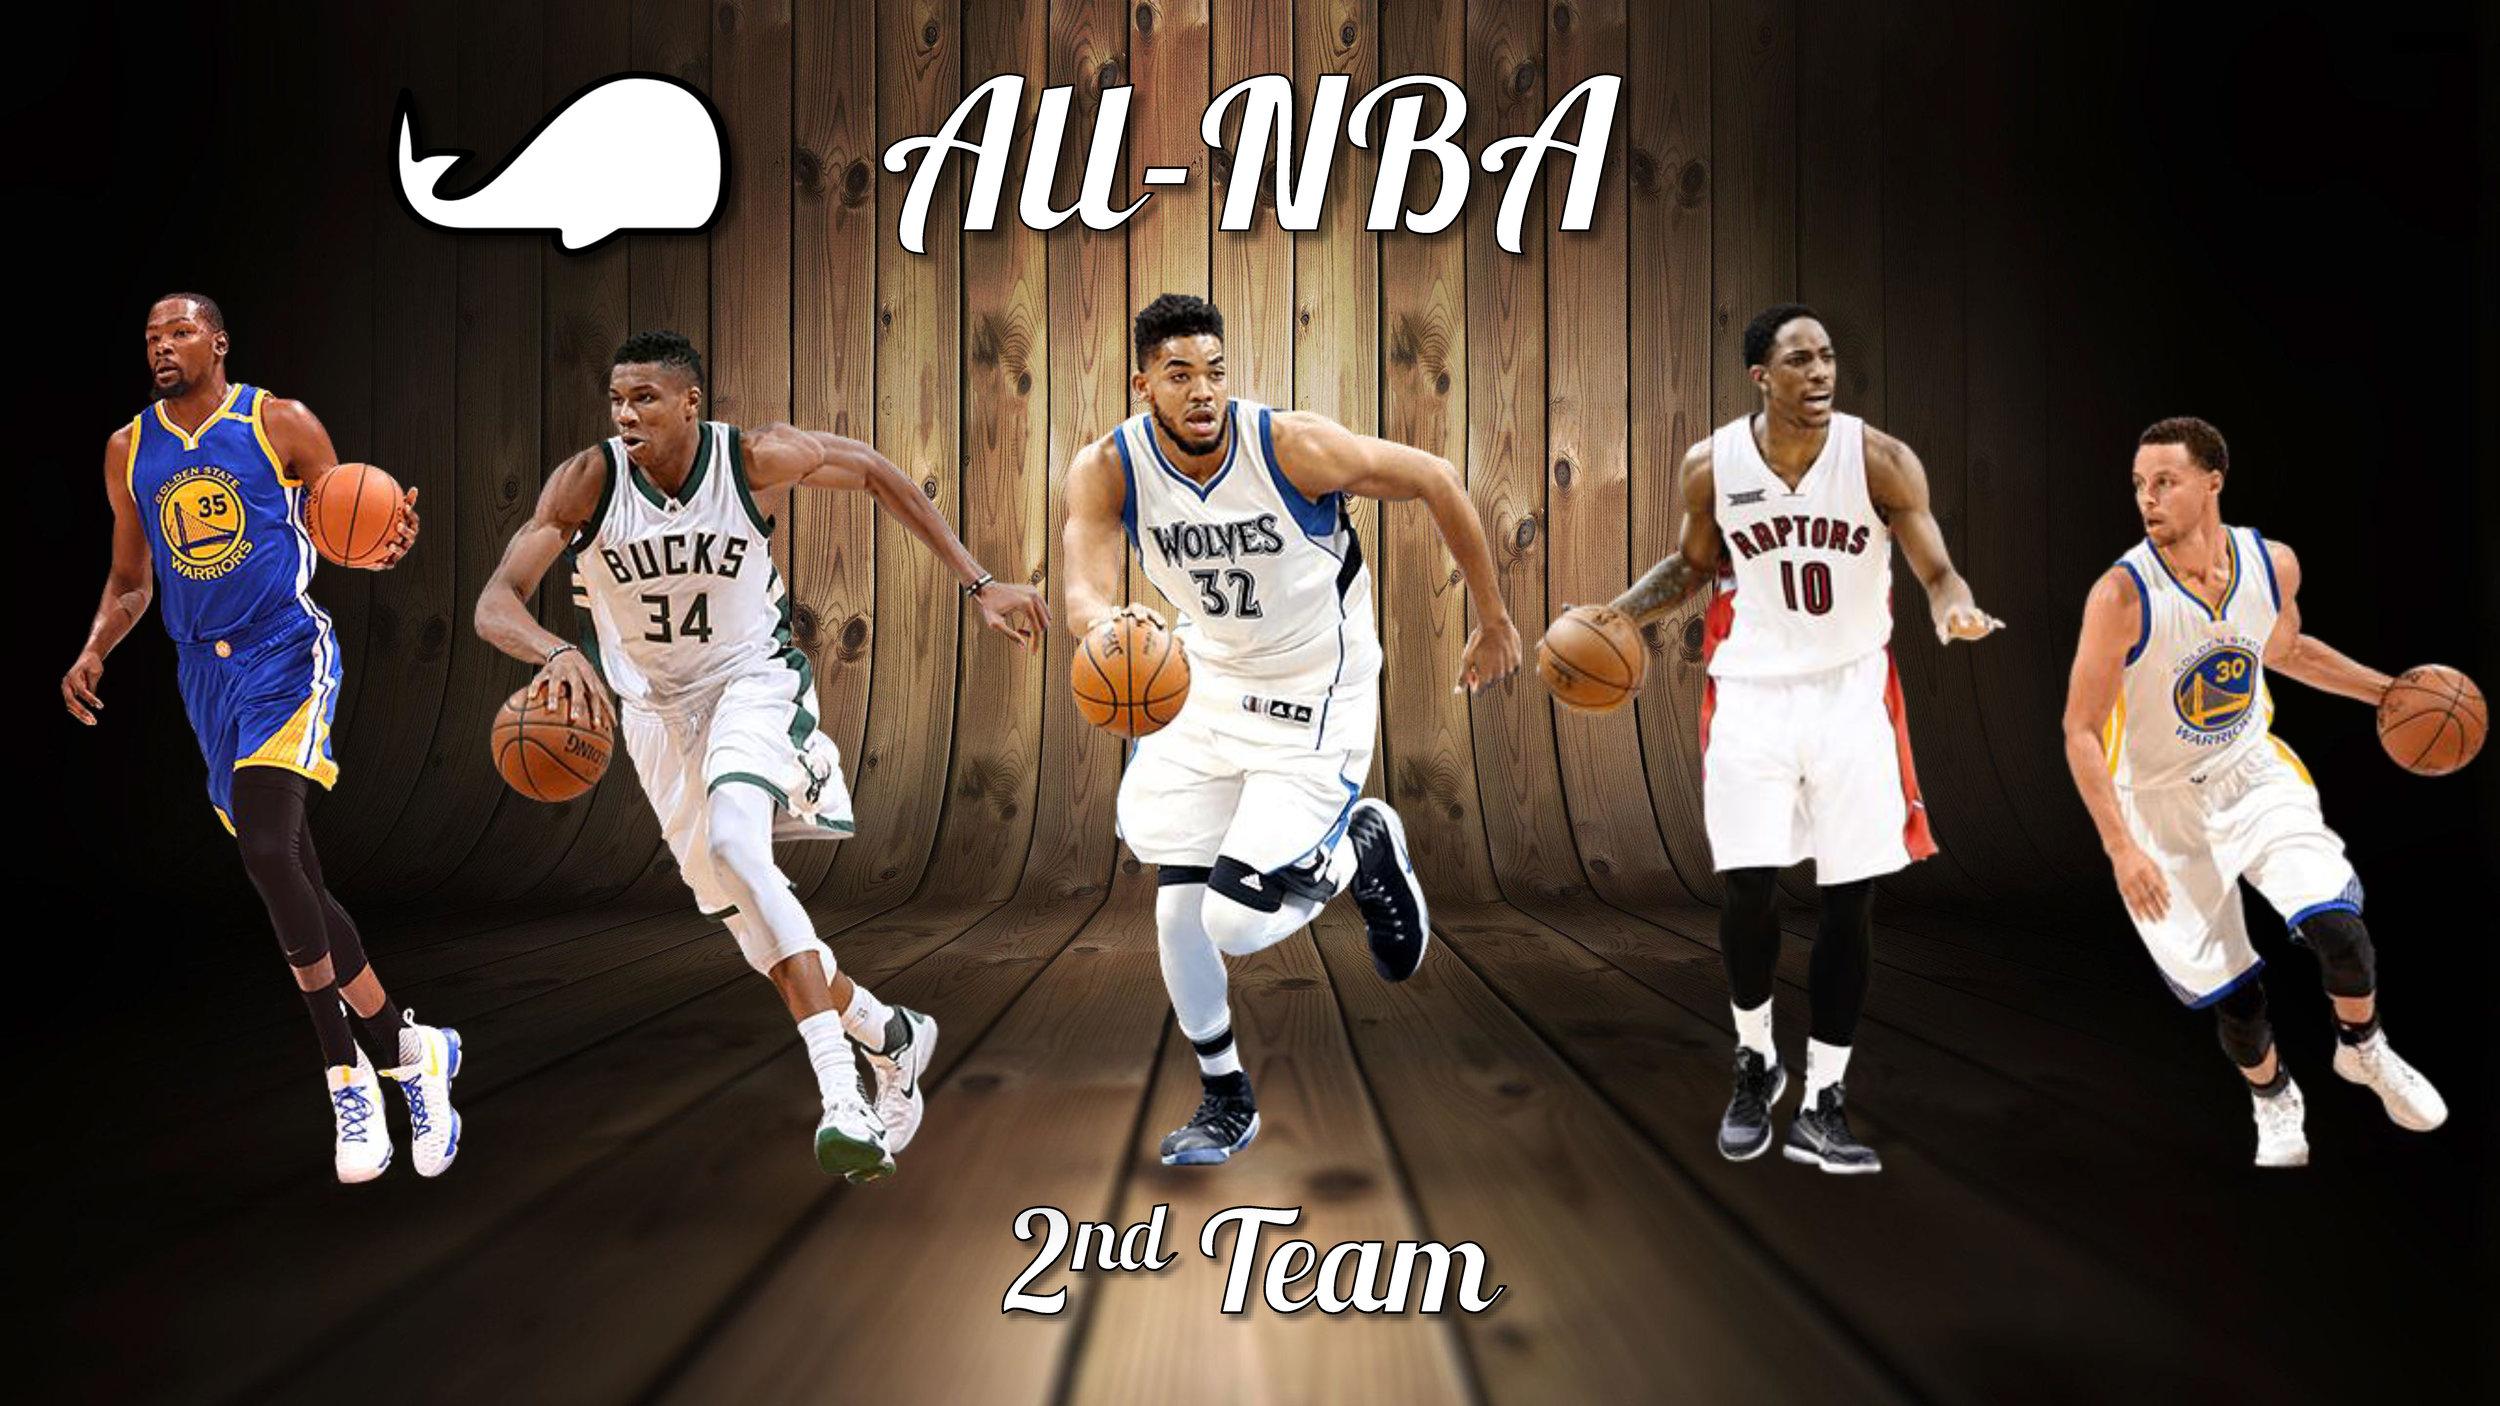 WW_2017_All_NBA_Page_2.jpg